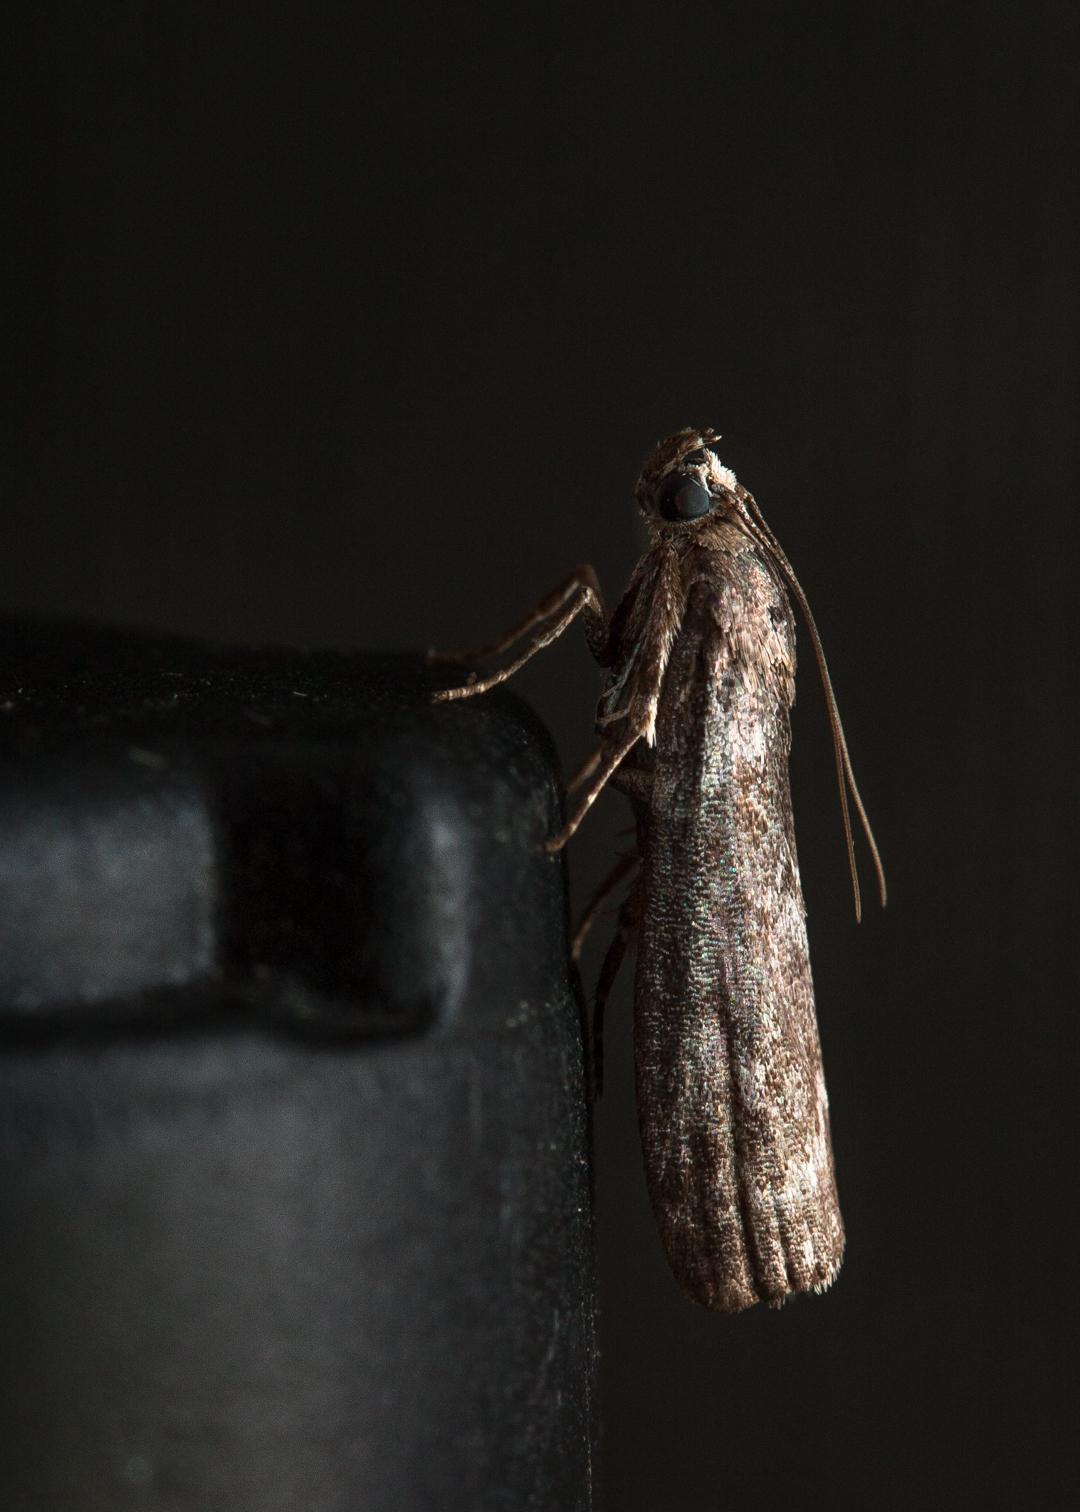 Image taken using flash with daylight setting